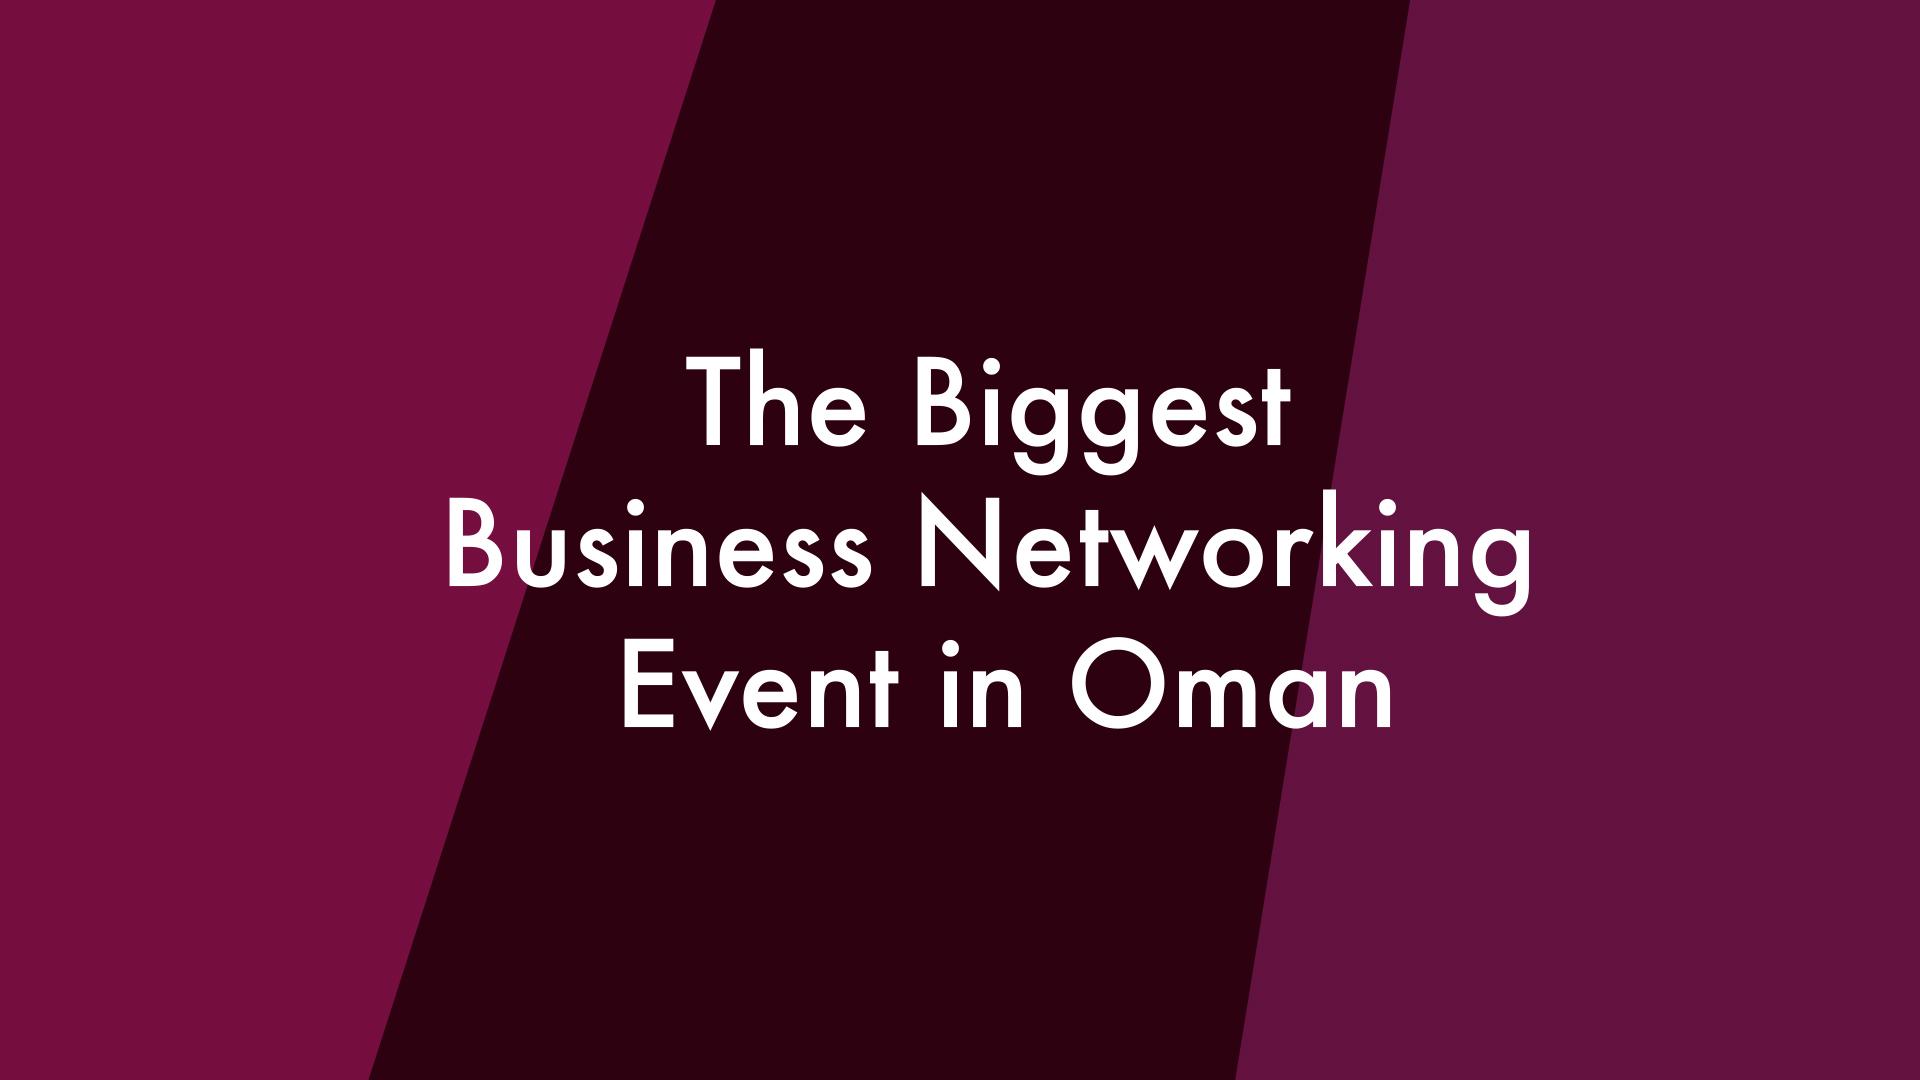 Back 2 Business Oman Statement